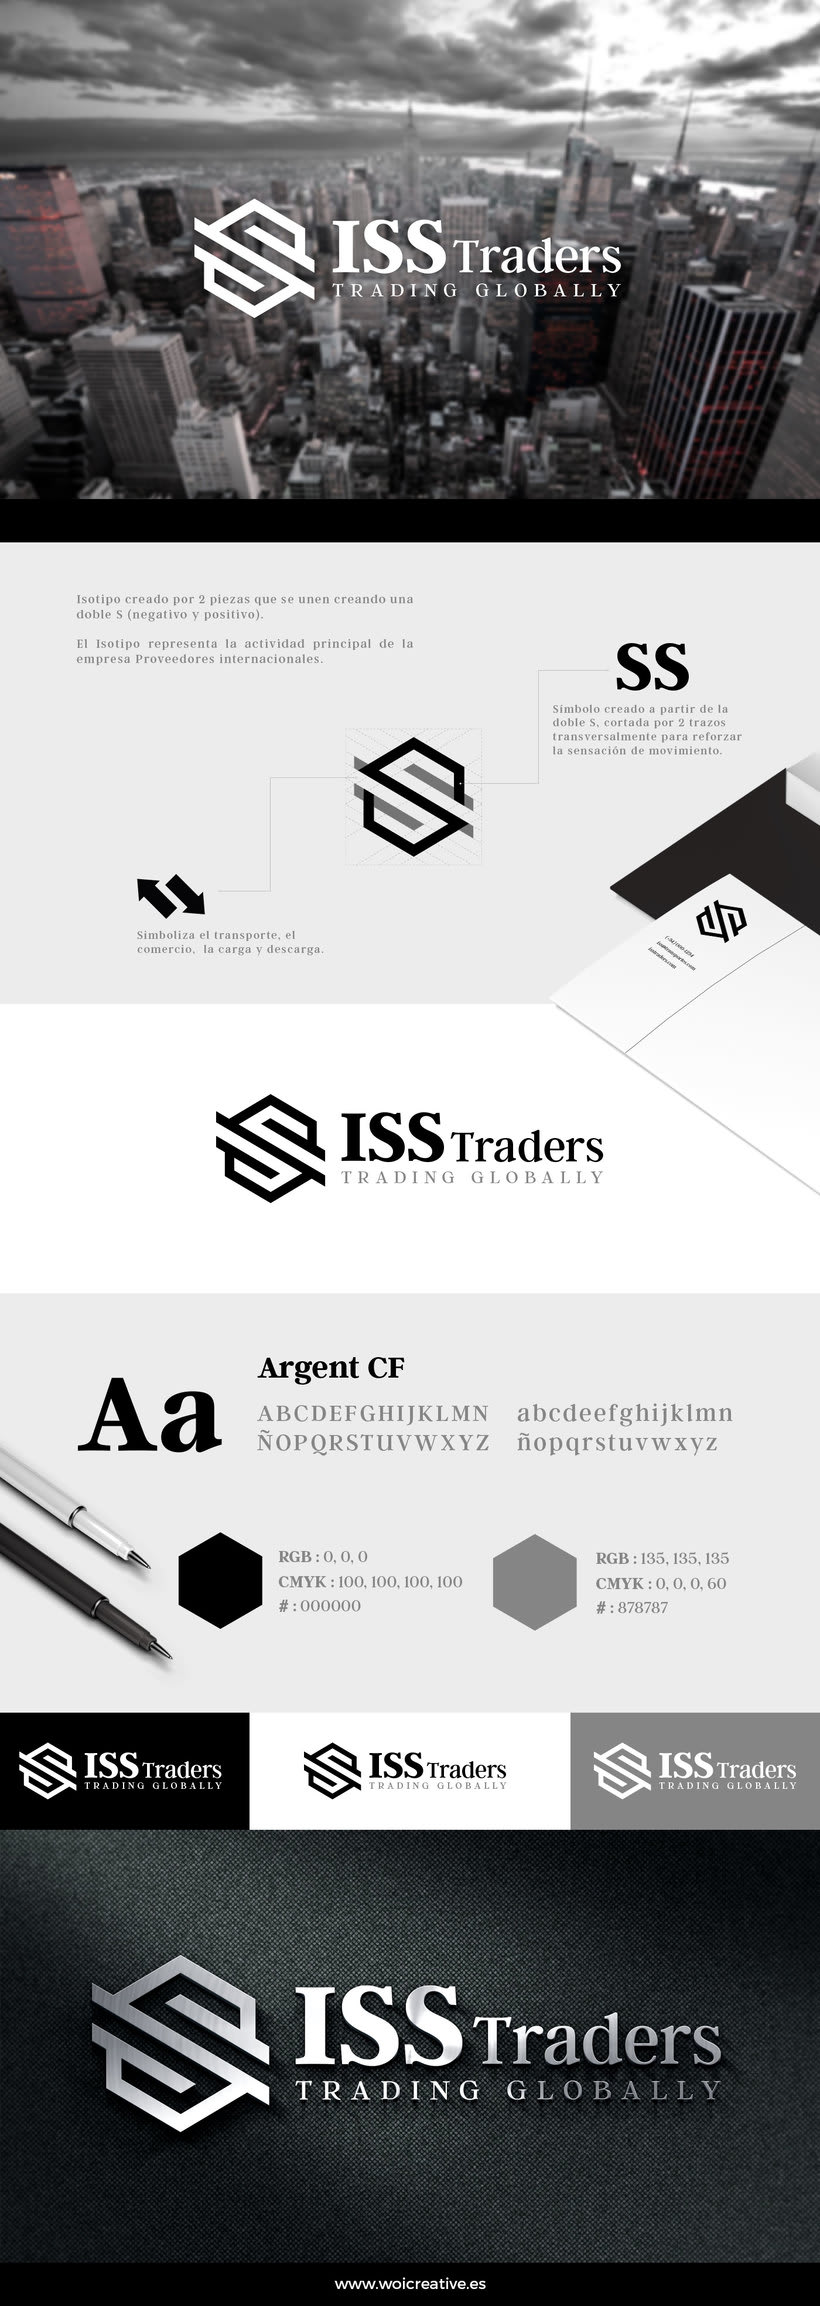 Identidad Visual ISS Traders 0